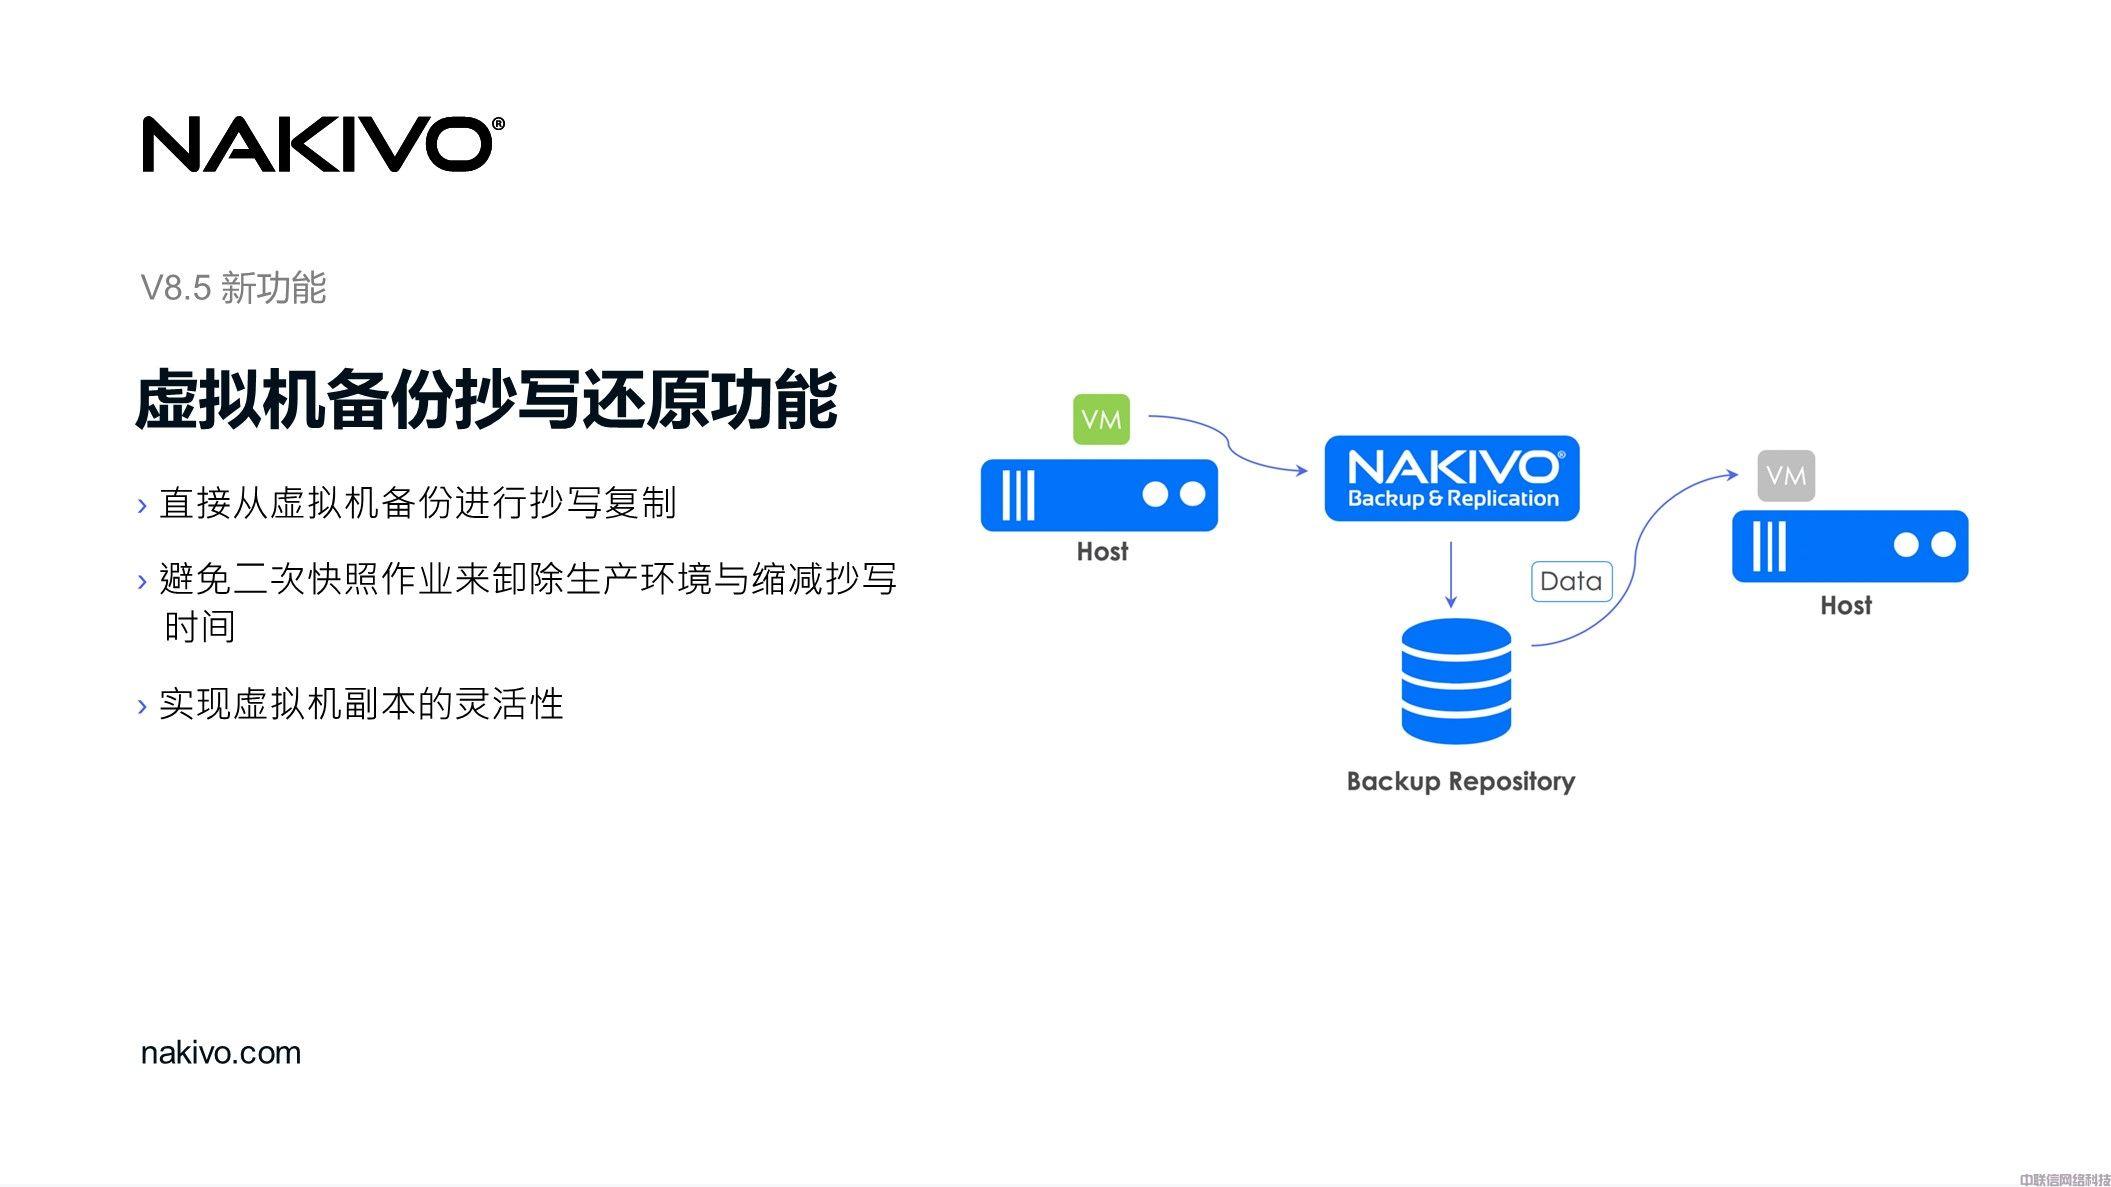 虚拟化备份方案NAKIVO Backup & Replication(图38)